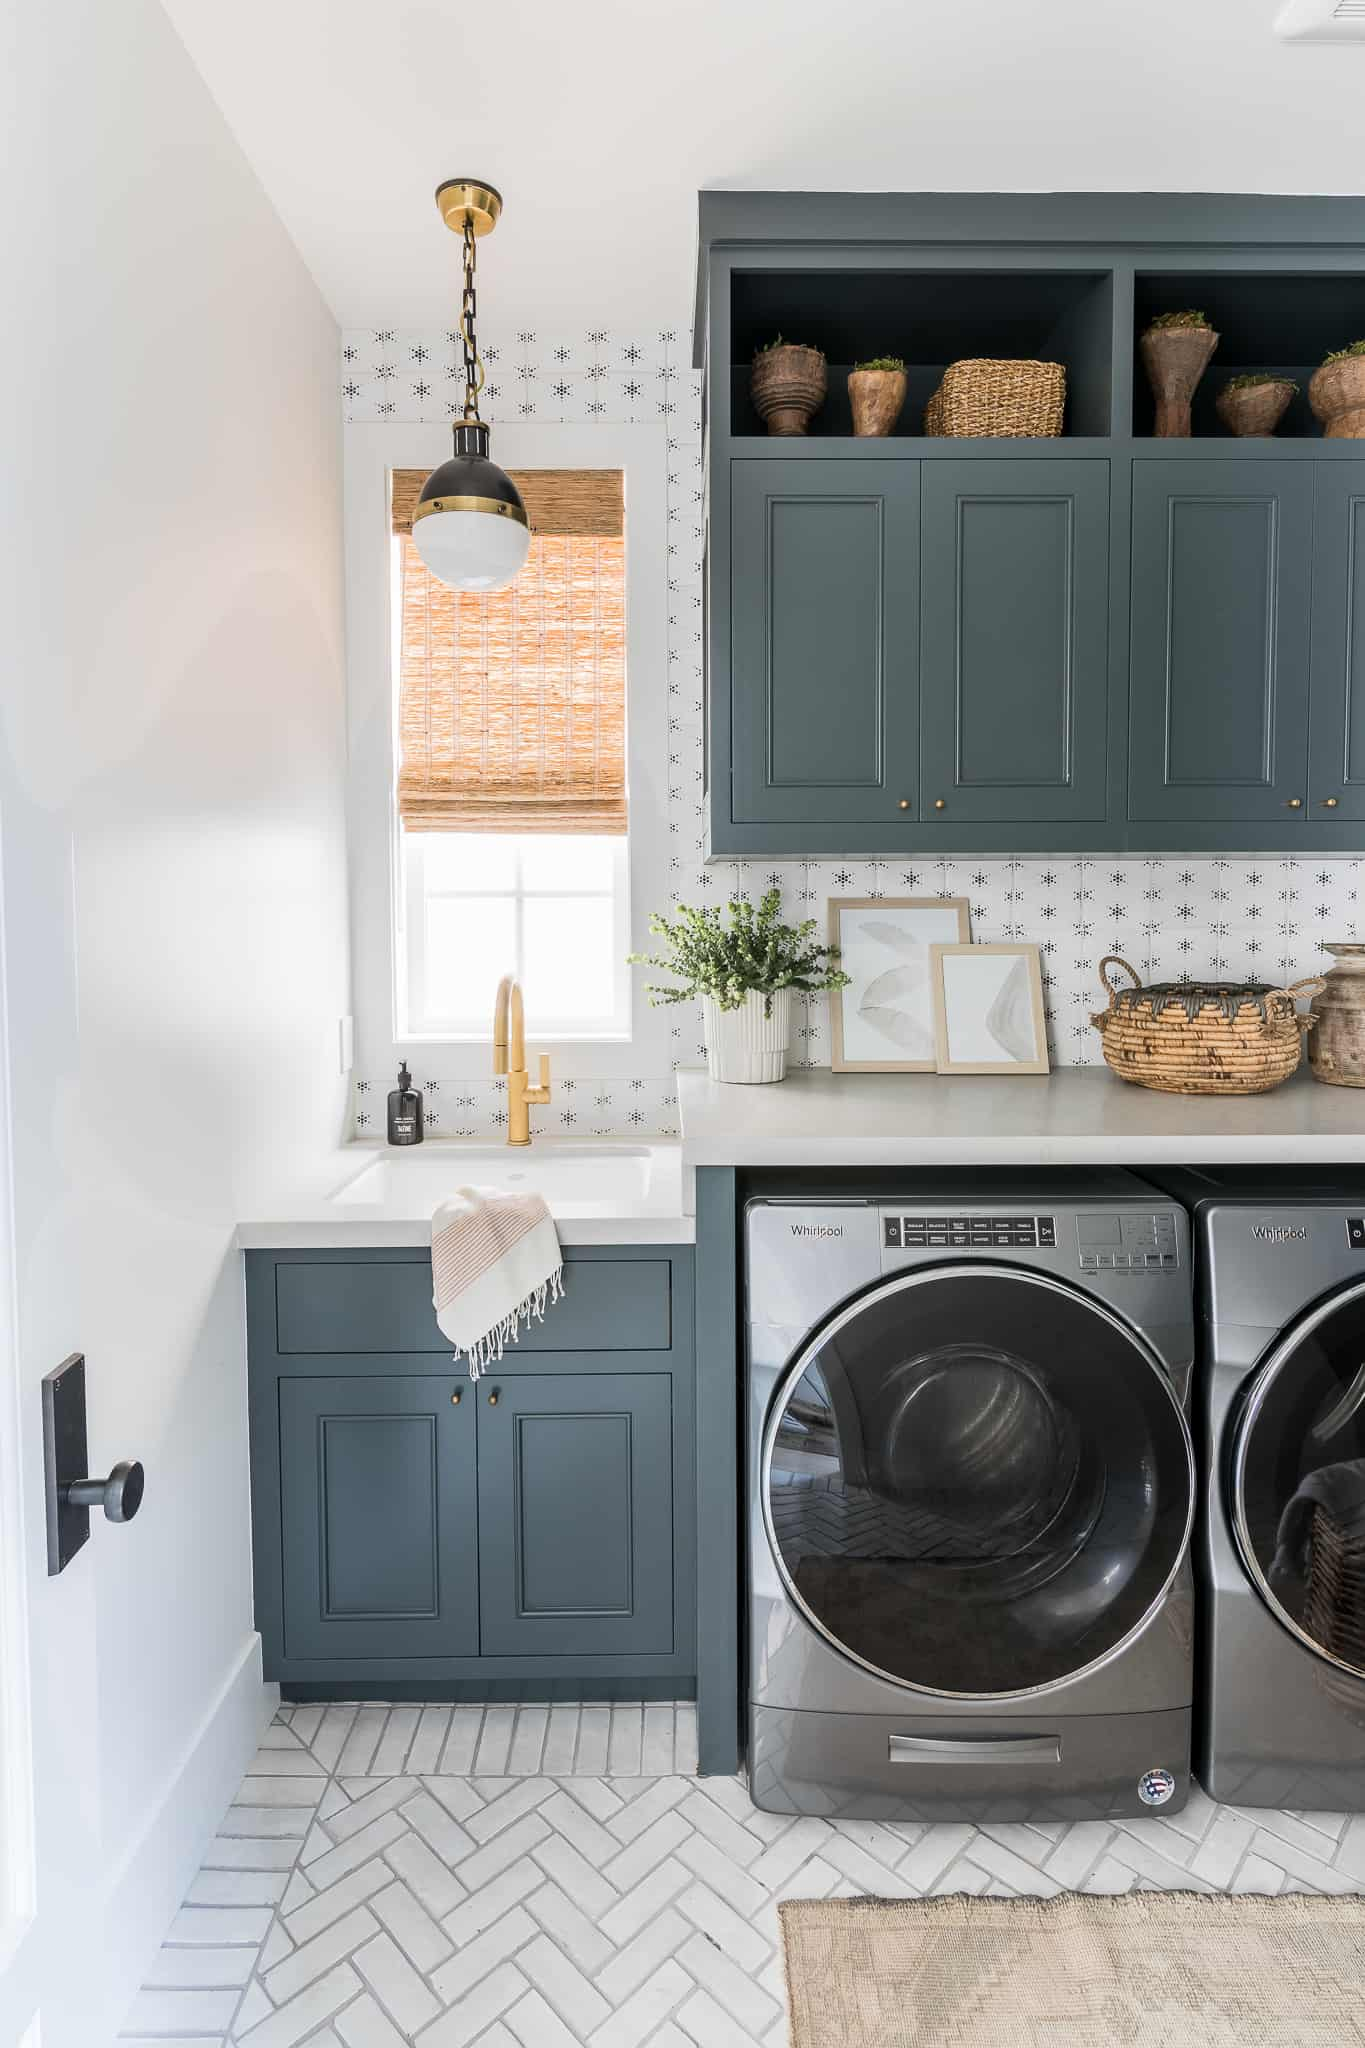 Marigold Laundry Room Thumbnail Image